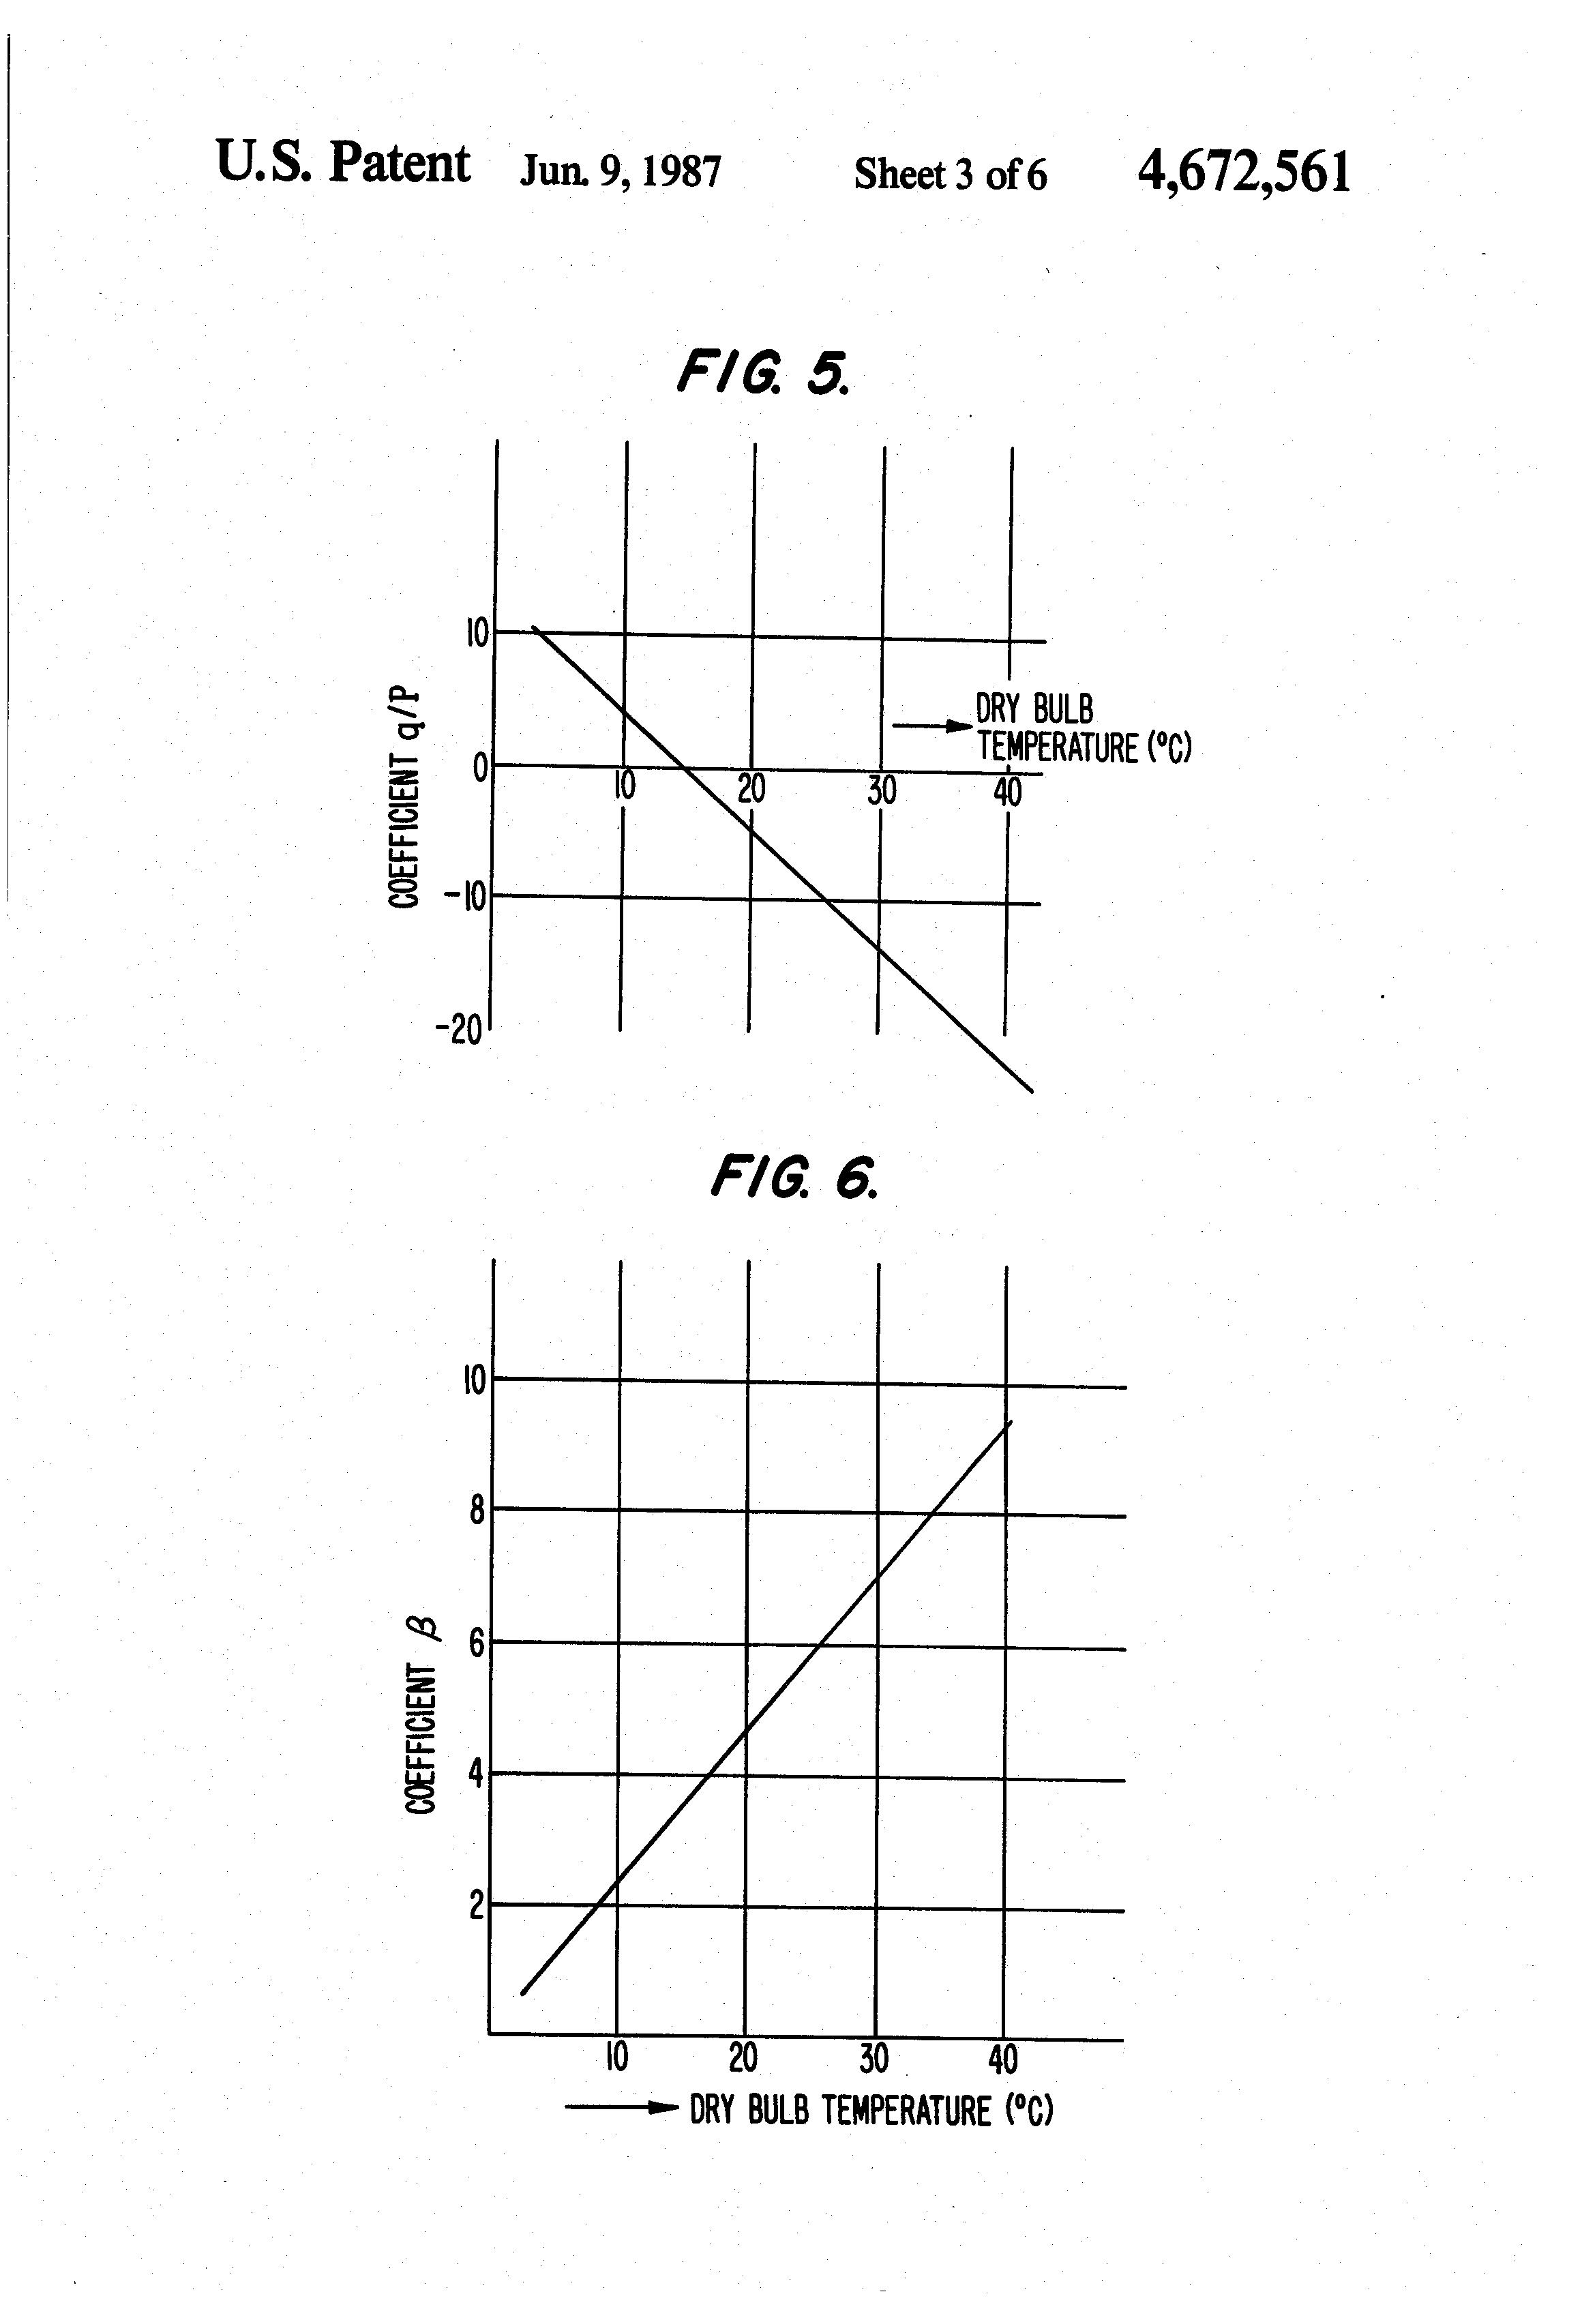 Steam Table And Mollier Diagram Epub